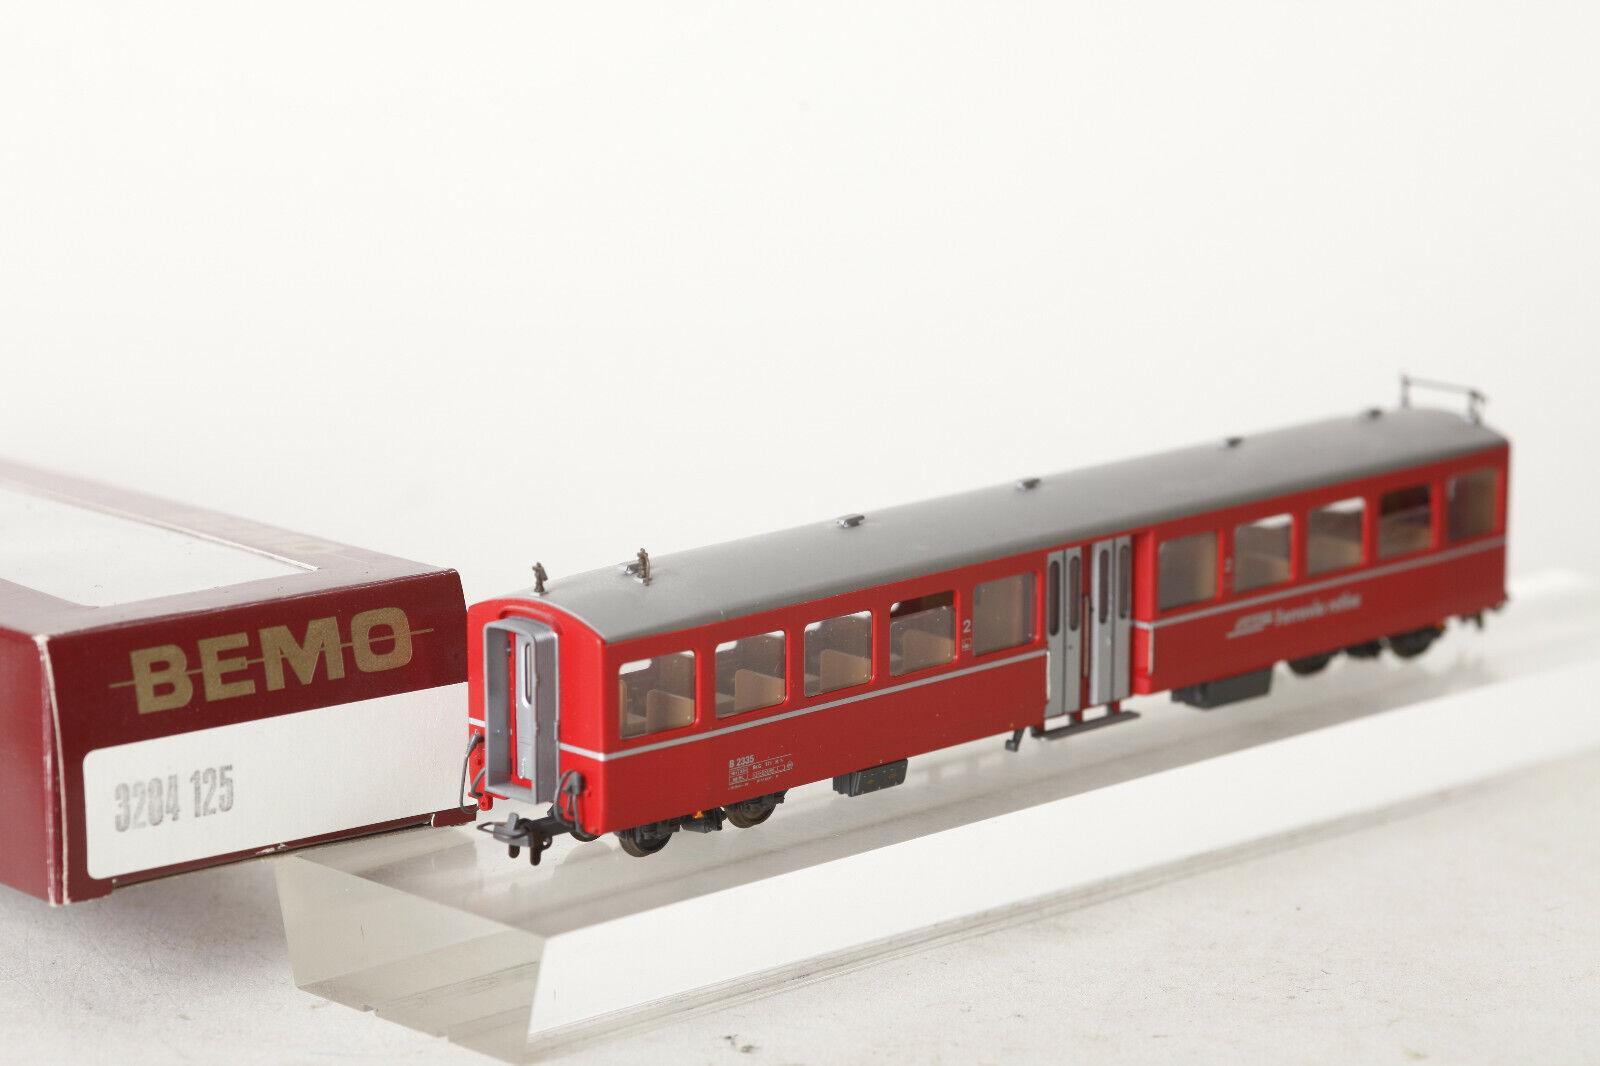 Bemo H0m 3284 125 Mitteneinstieg Rhb Ferrovia Retica B2335 Rosso Conf. Orig.